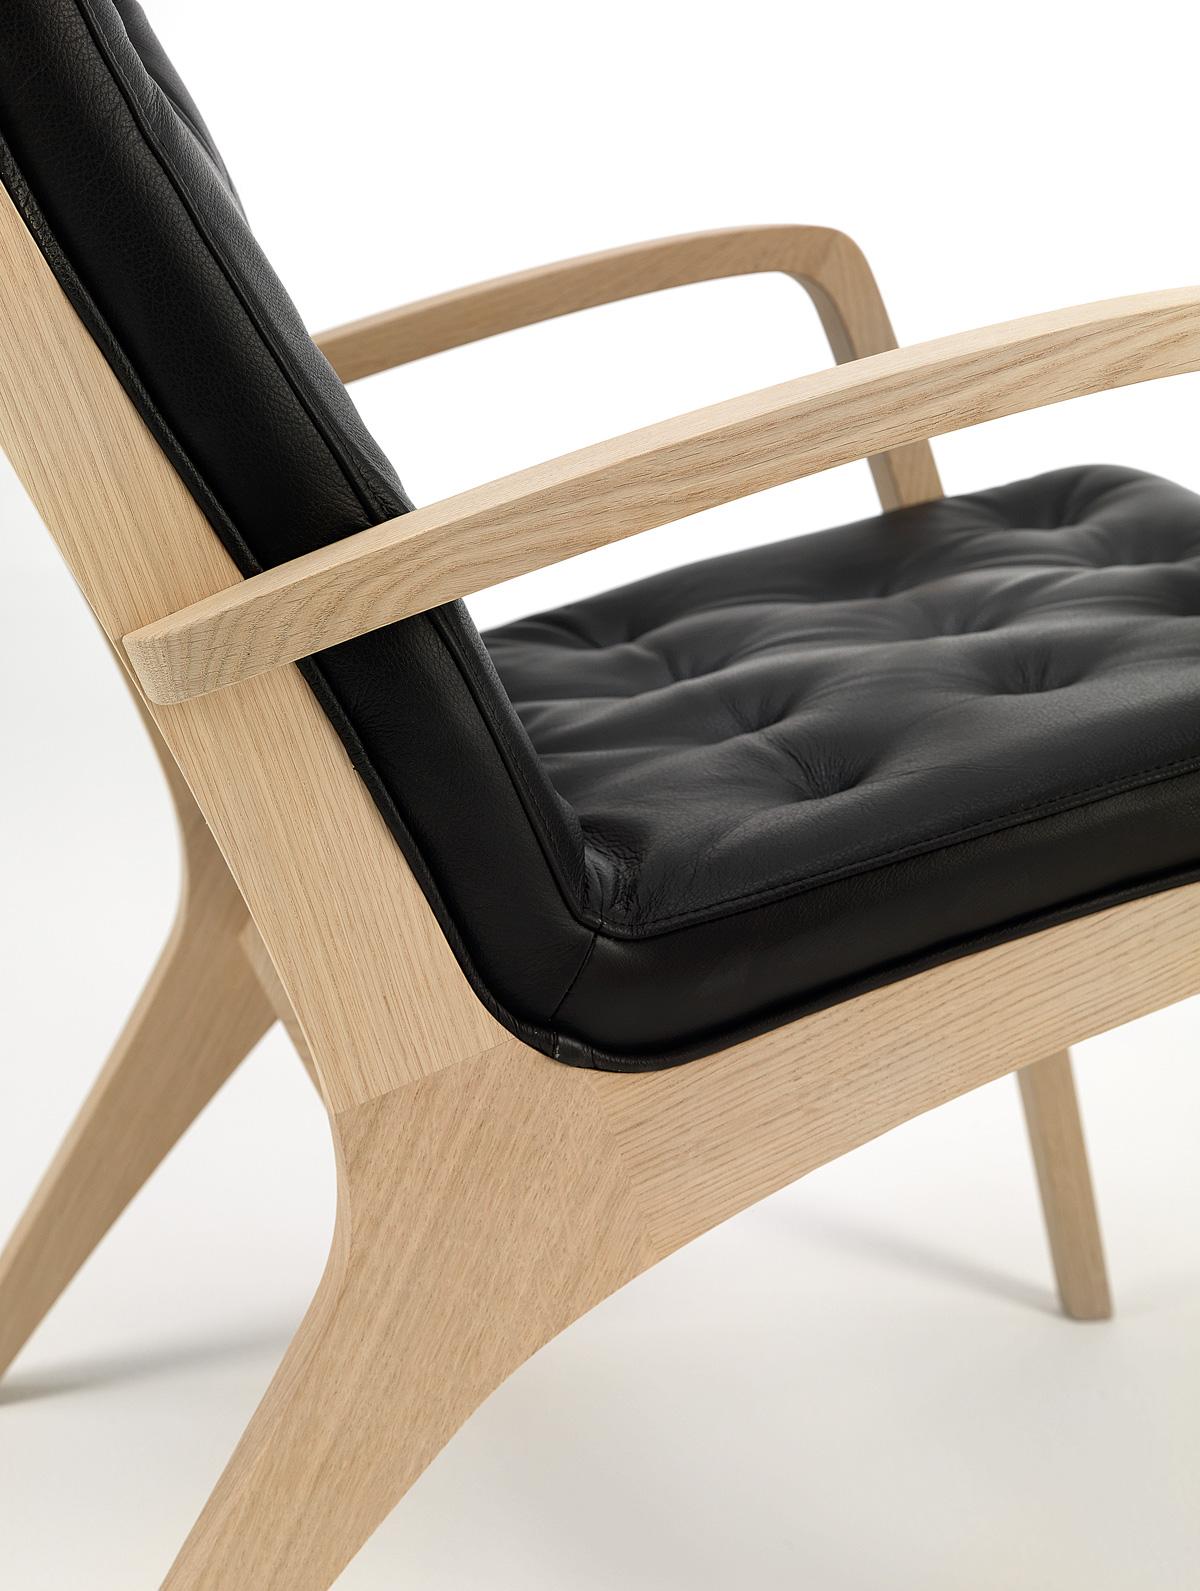 schou andersen møbelfabrik - snedkermøbler til hospitaler, Garten seite